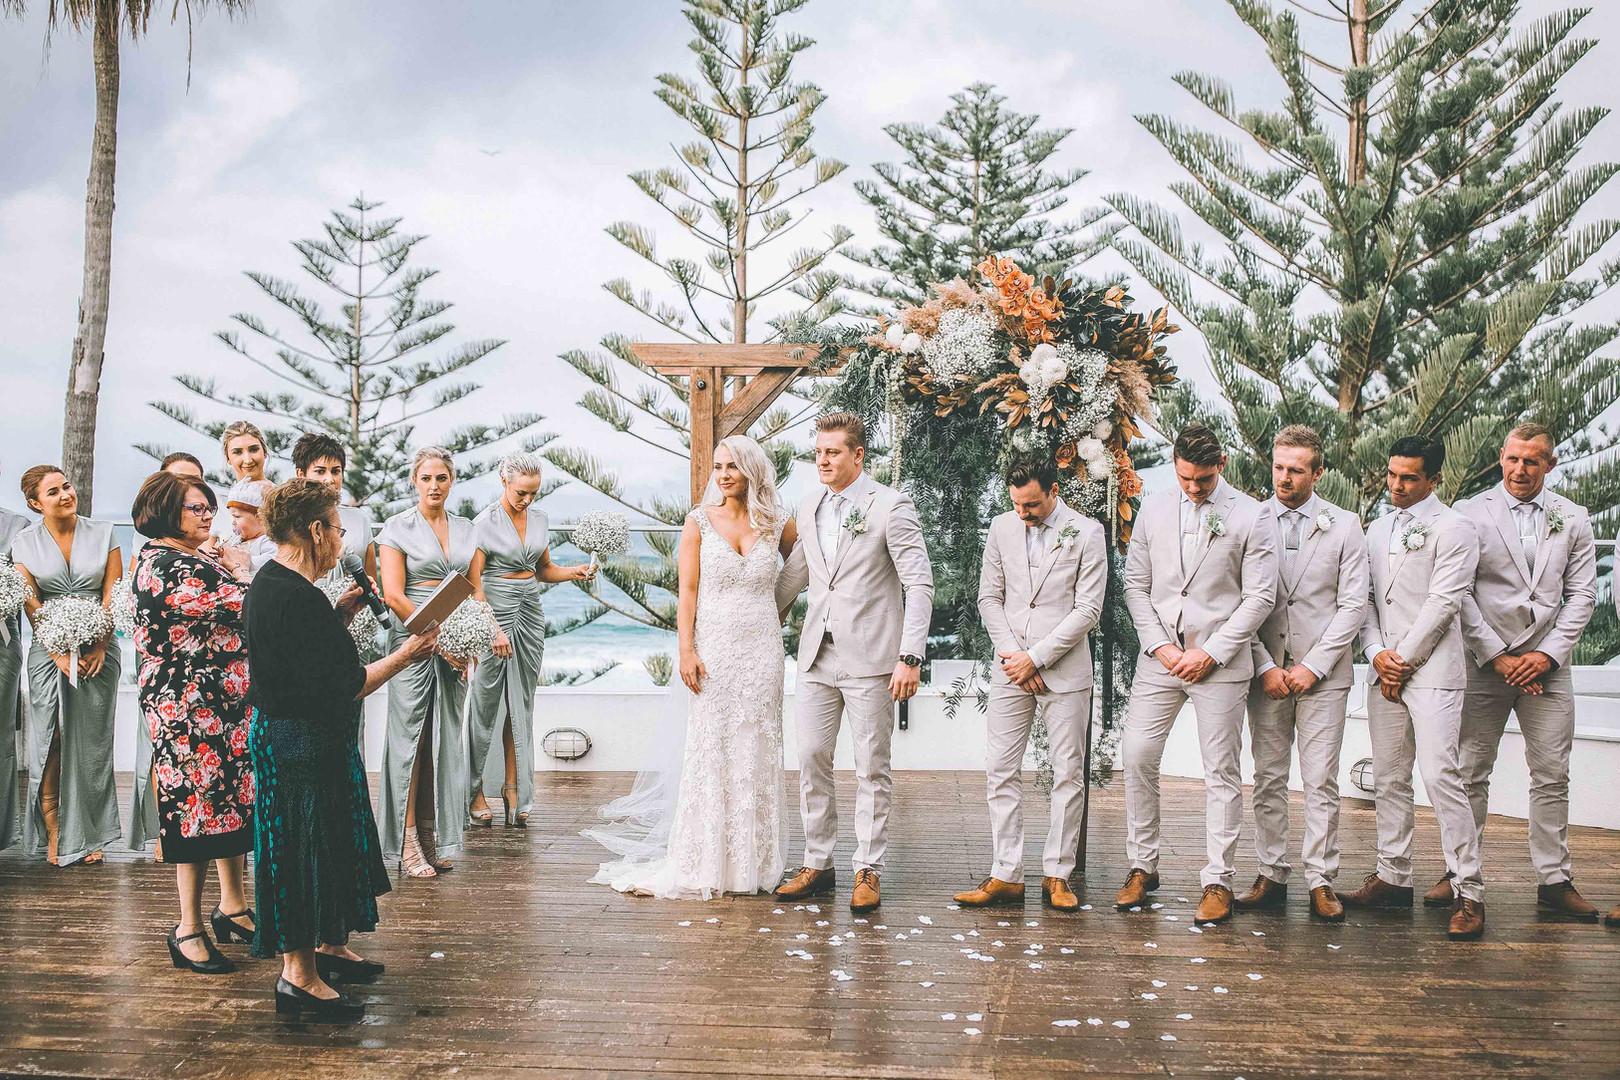 WeddingWebsite_Compressed_A2-2.jpg